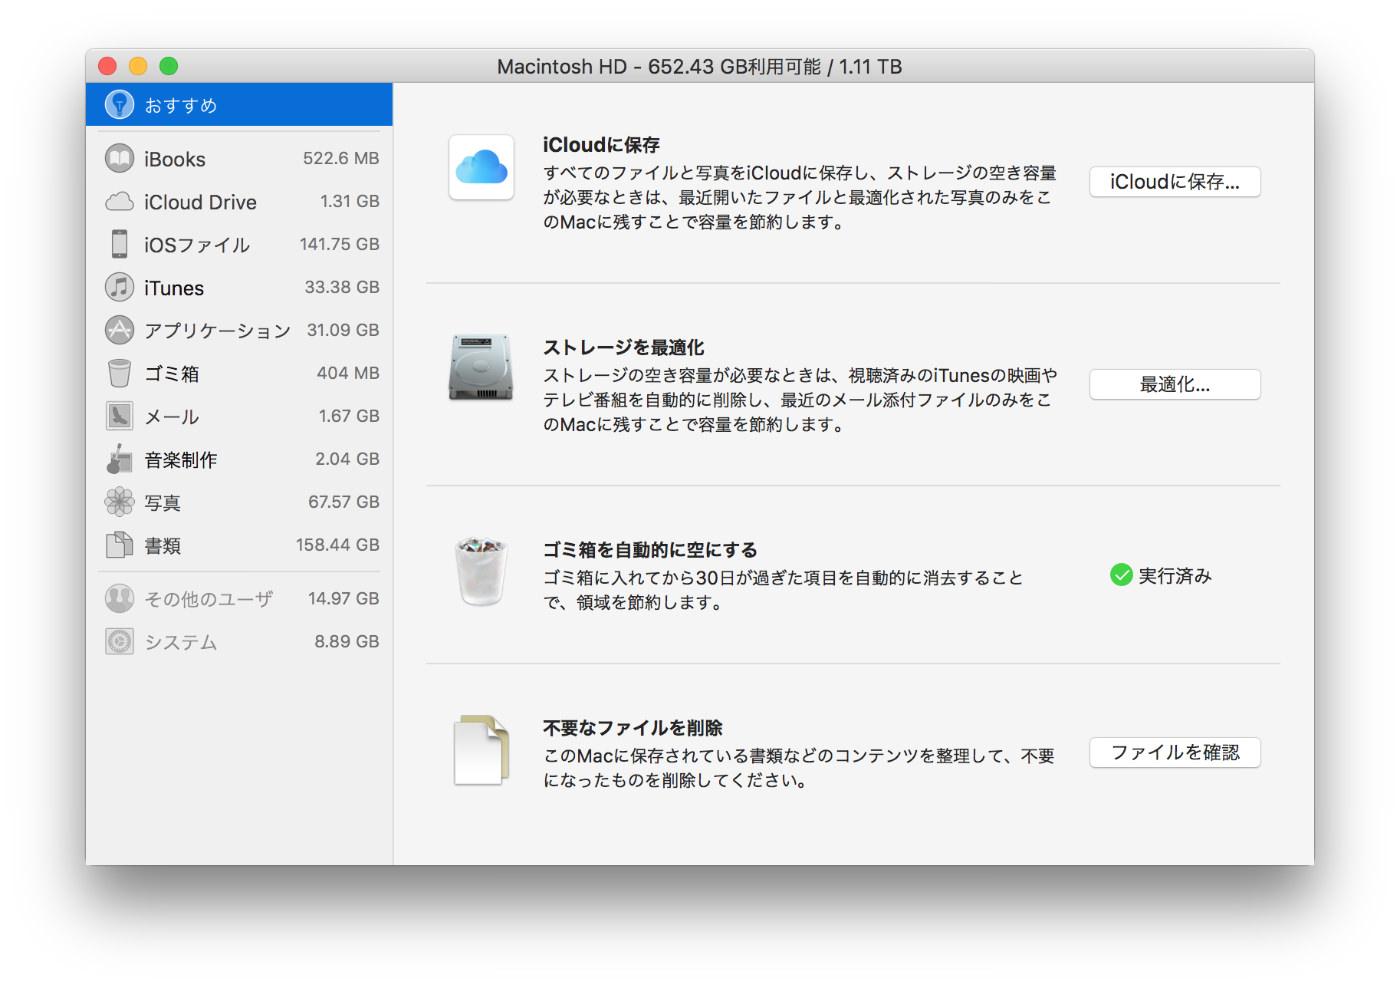 iMac 5K Retinaディスプレイモデル 管理画面-1